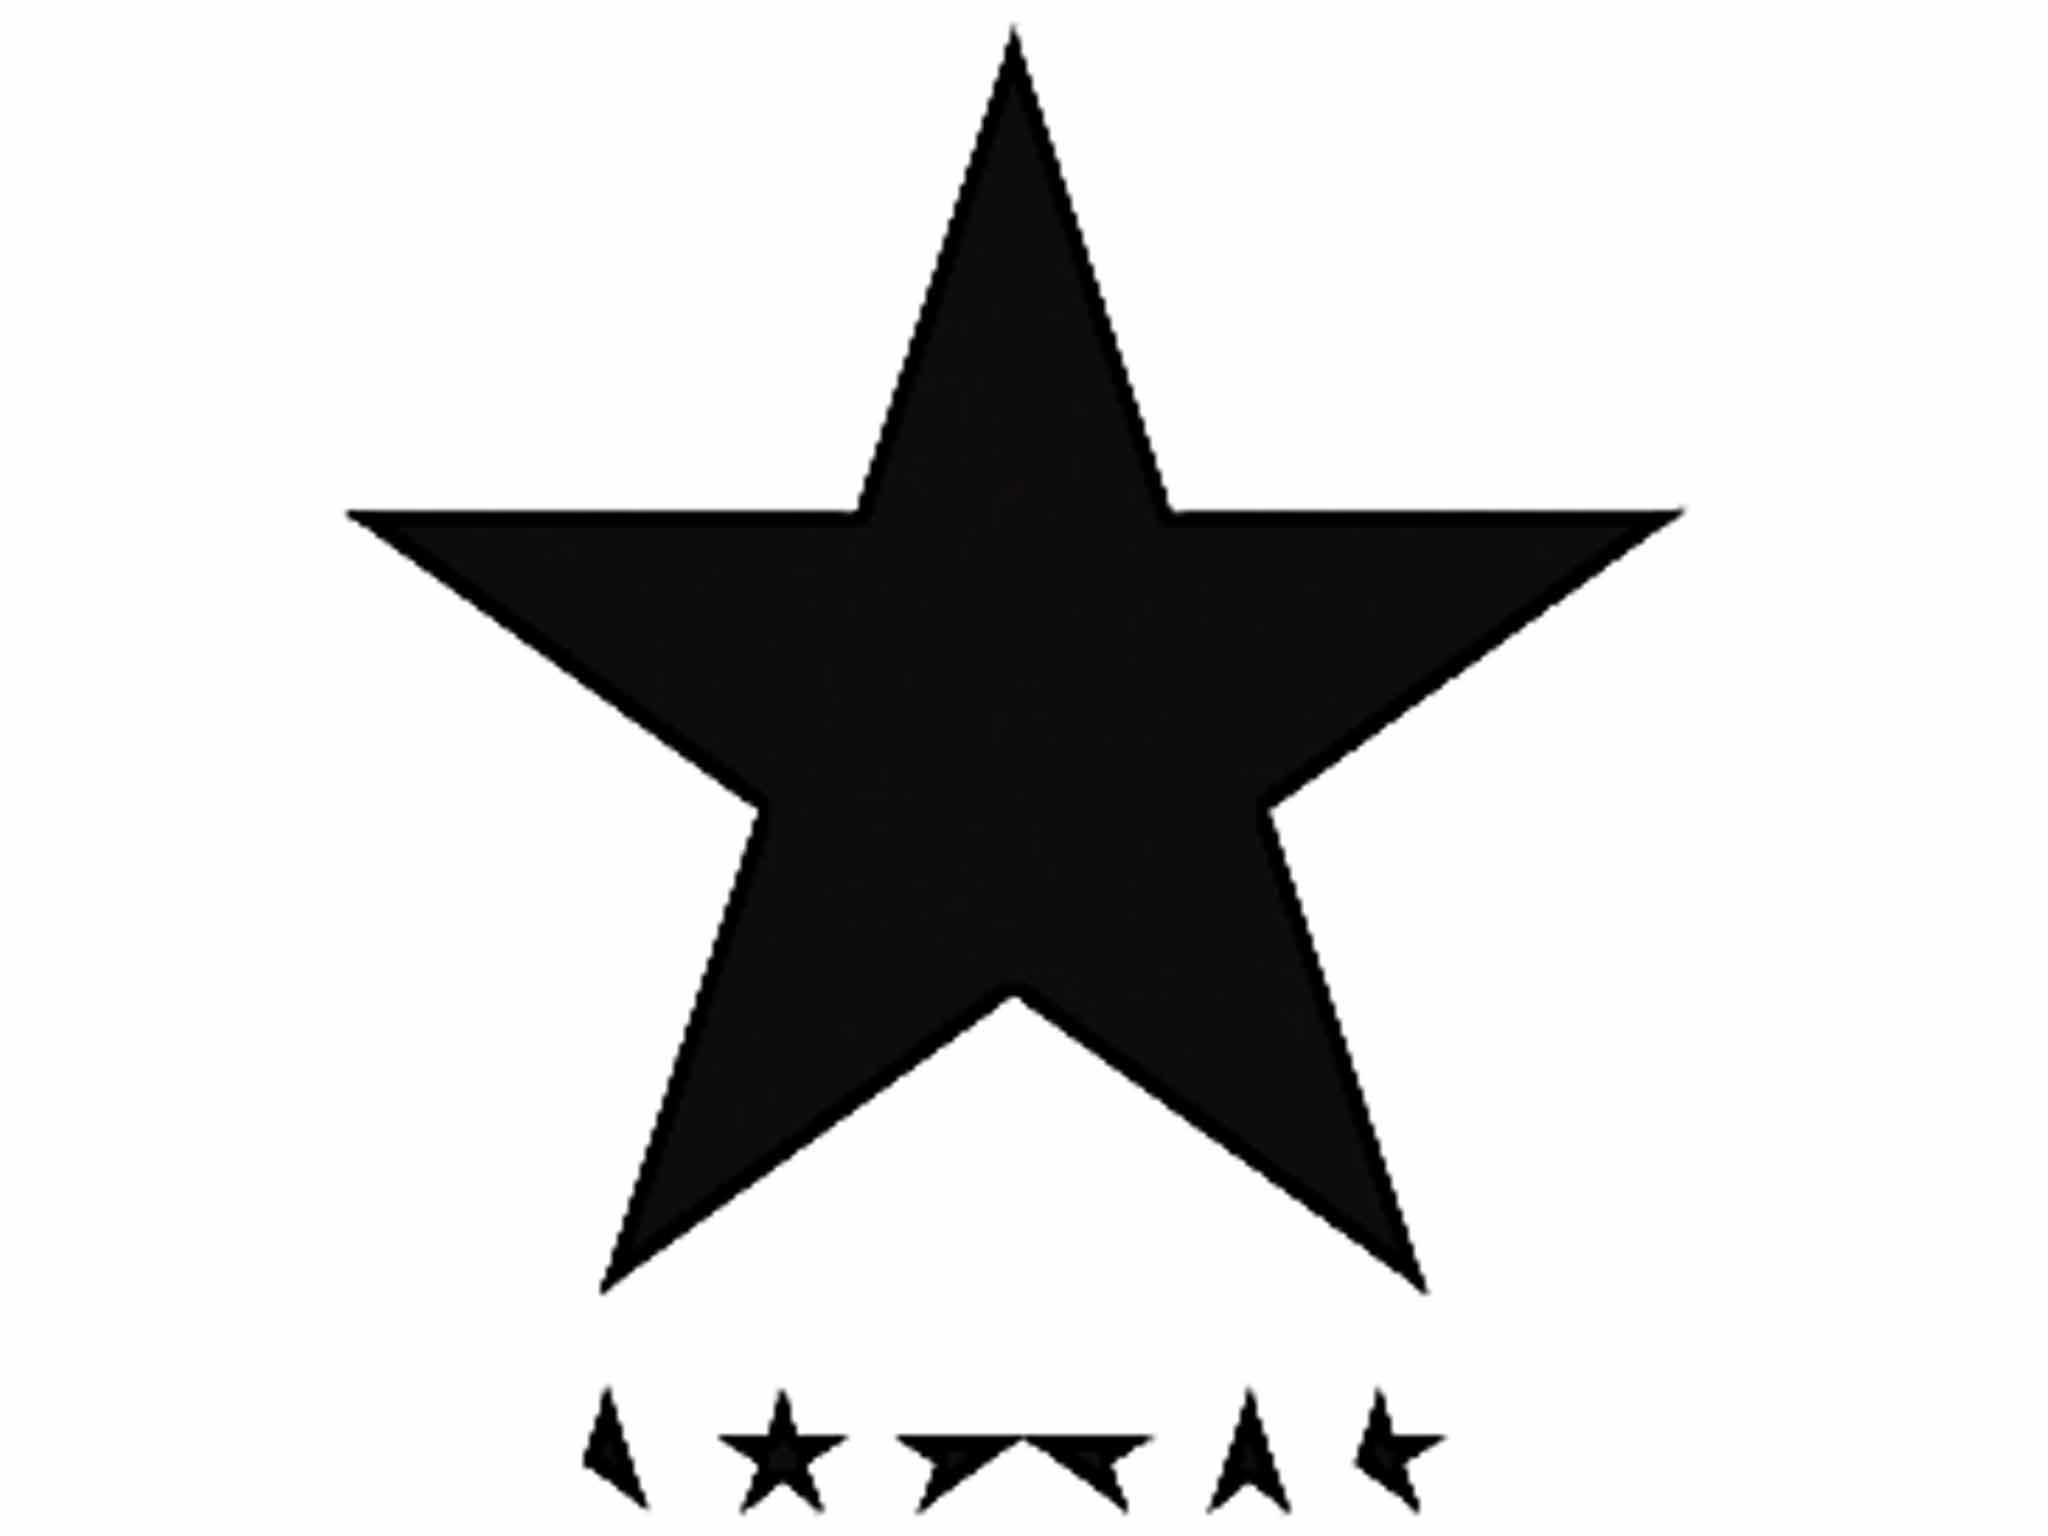 David Bowie - Blackstar cover art album art